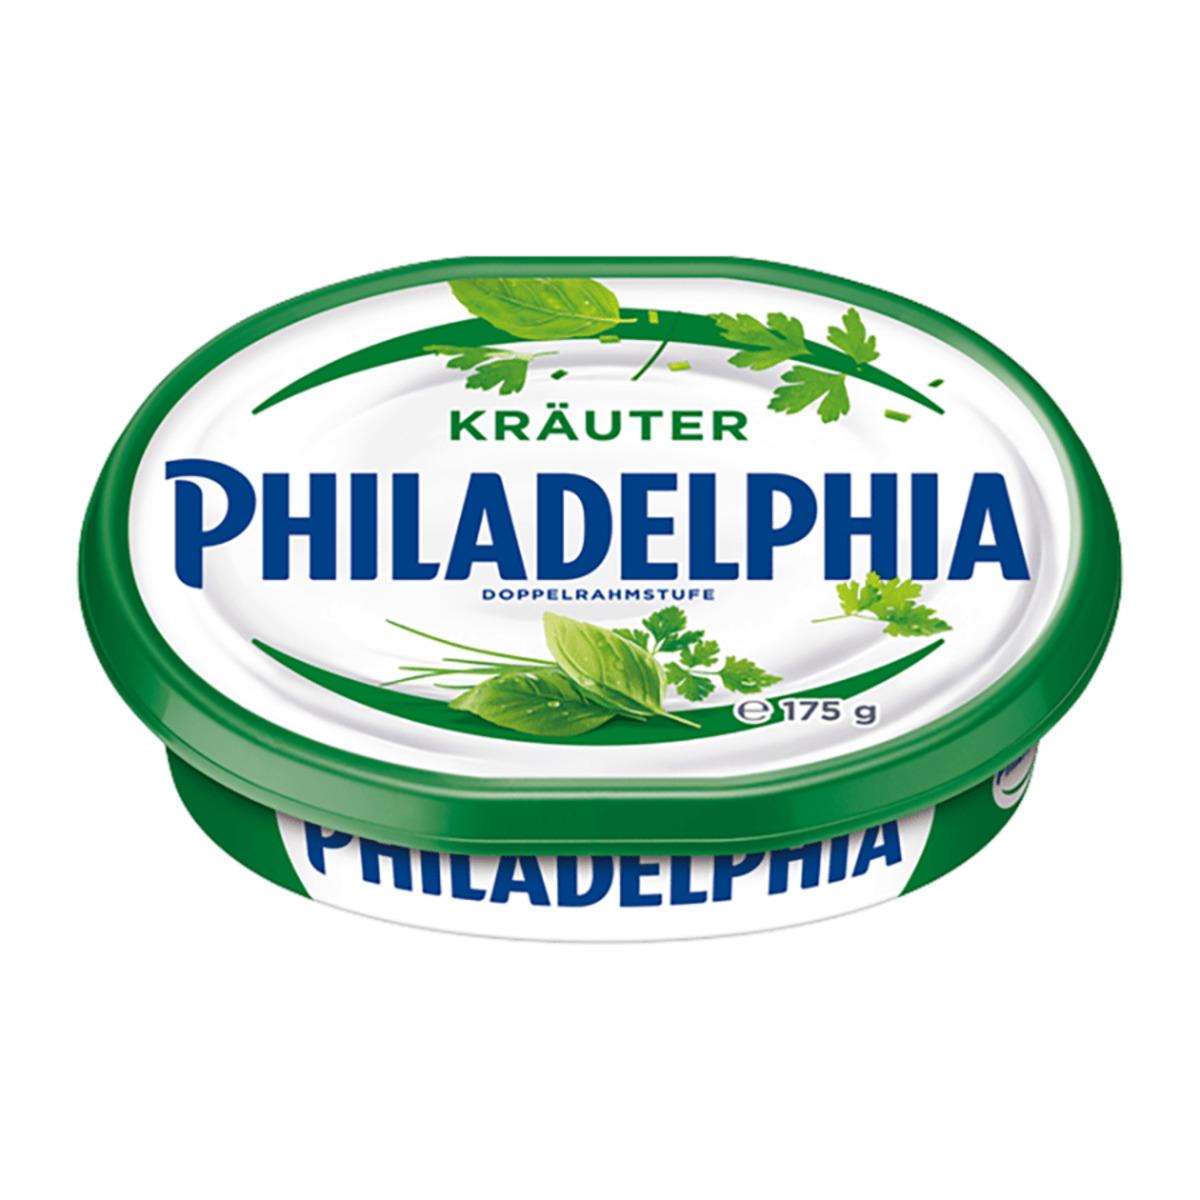 Bild 2 von Philadelphia